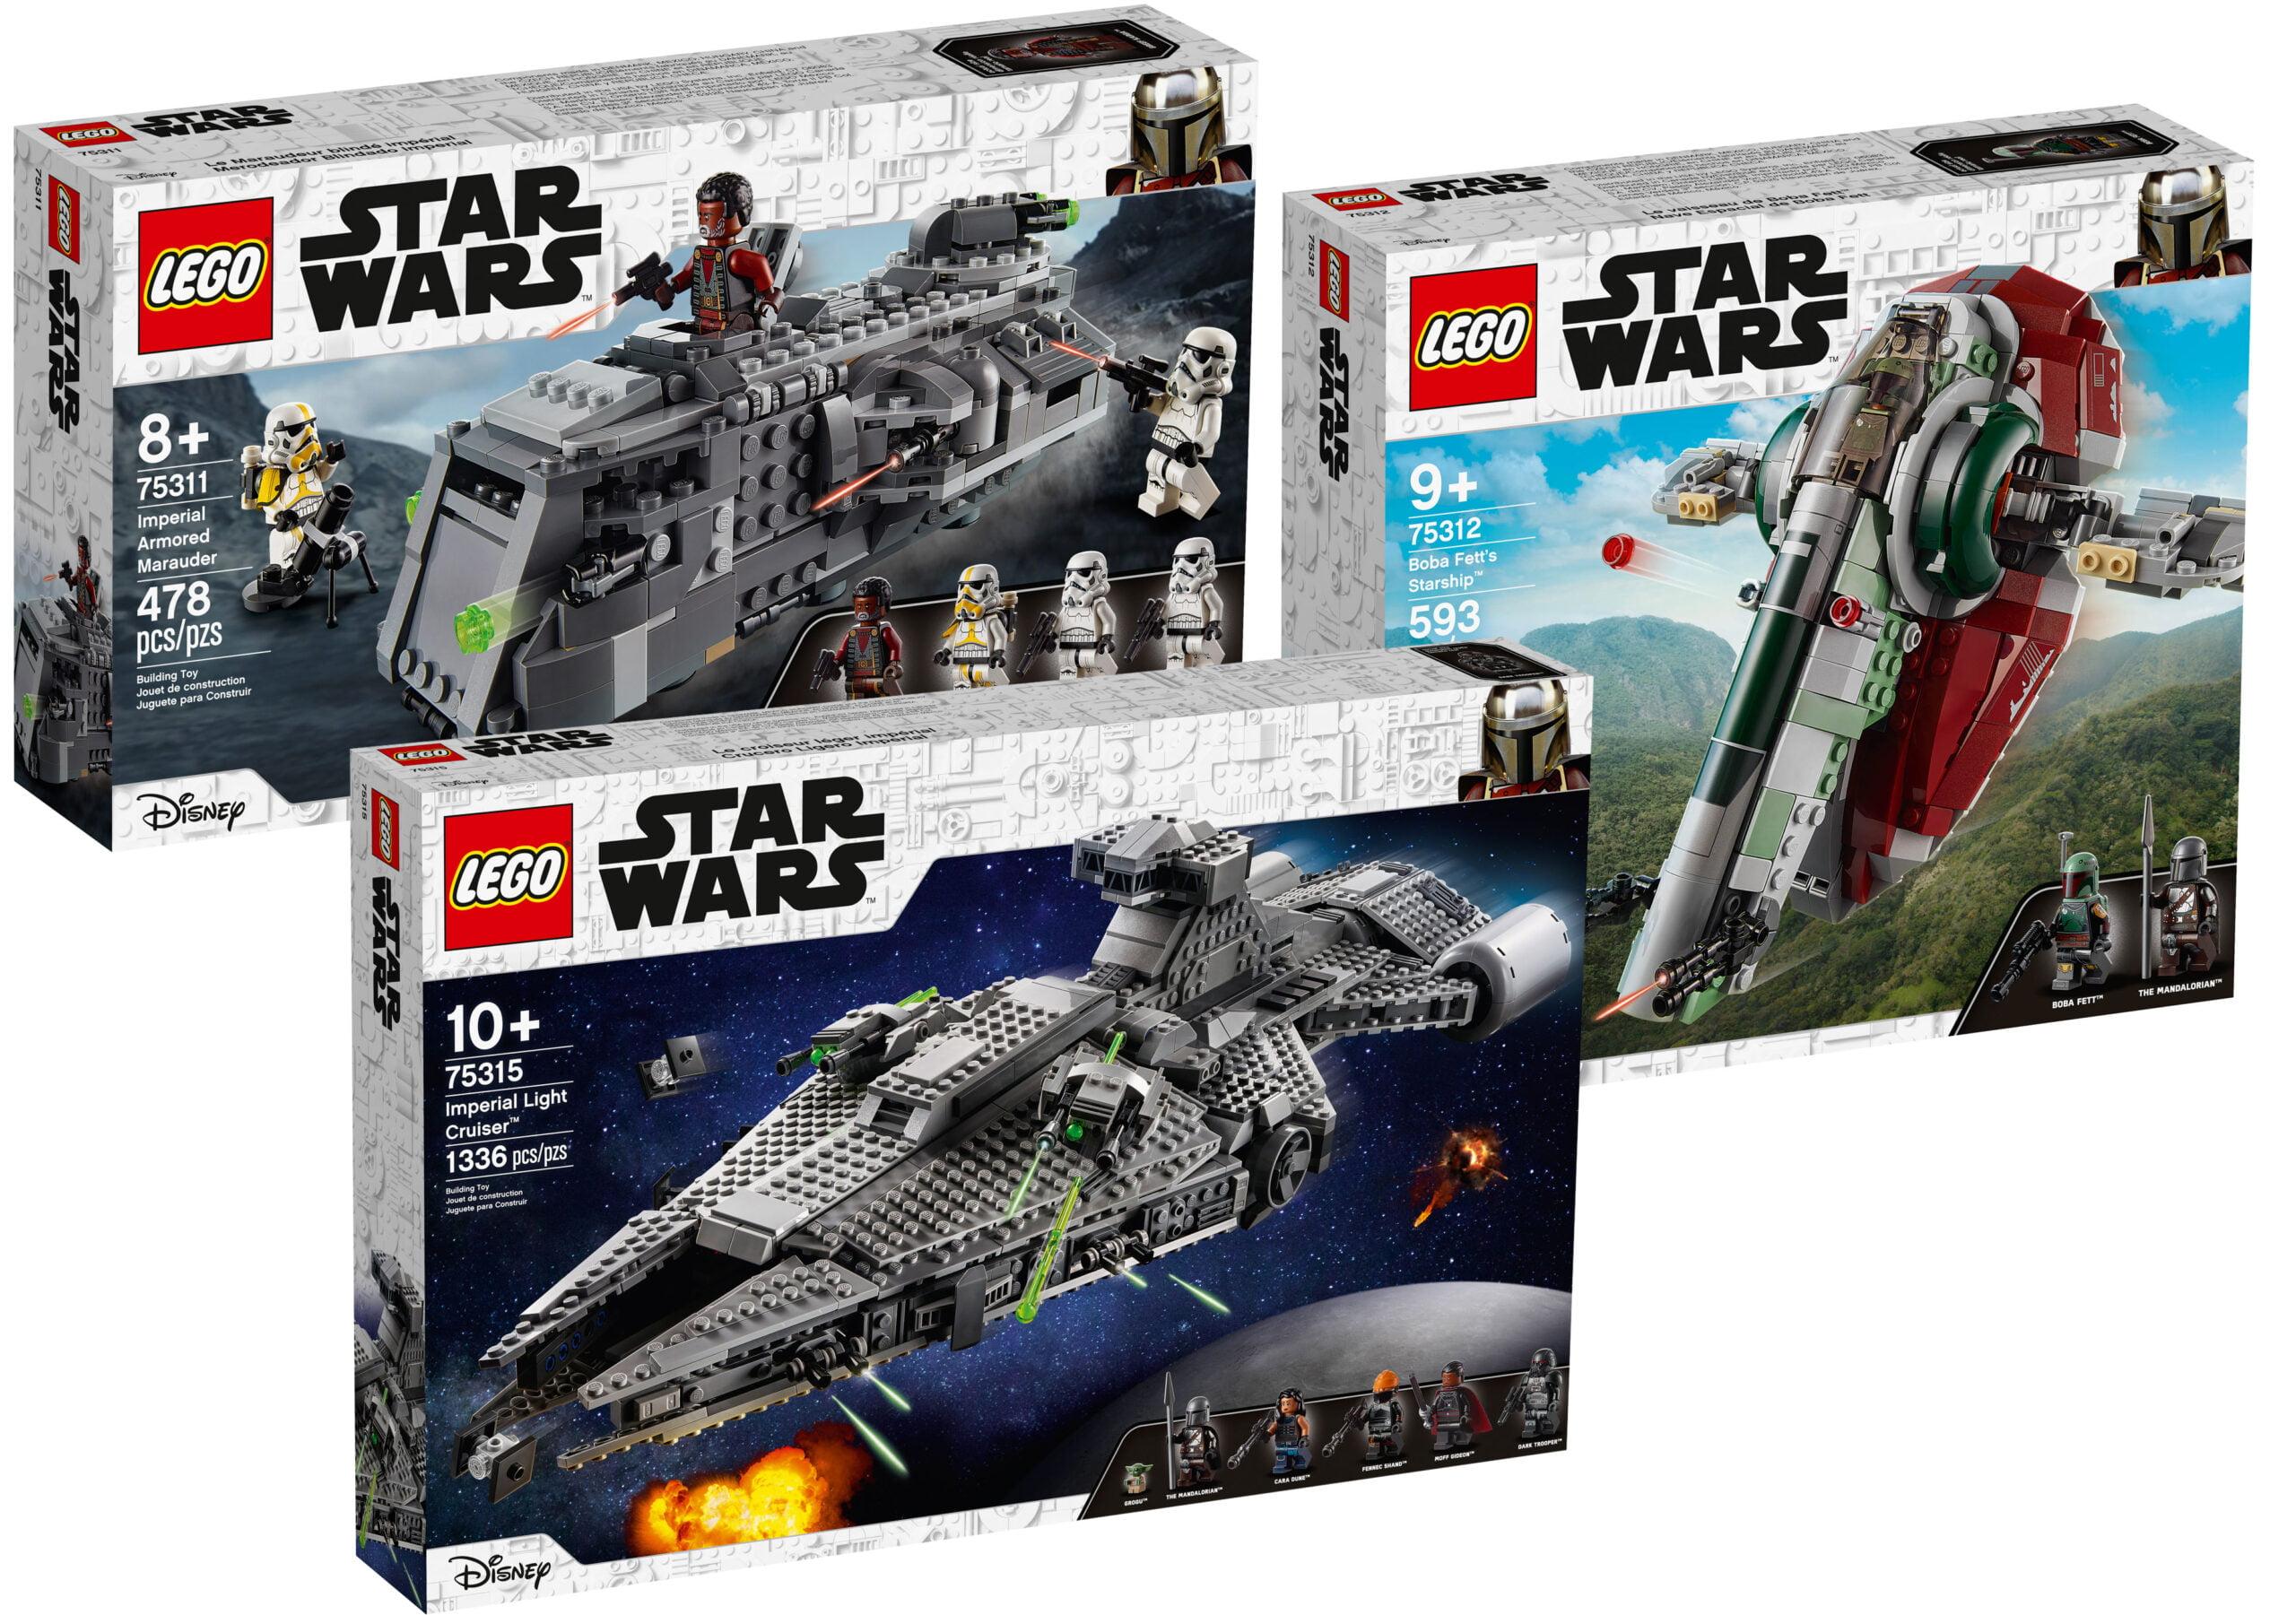 LEGO Star Wars 75315 Crucero Ligero Imperial, 75312 La nave estelar de Boba Fett y 75311 Imperial Armored Marauder